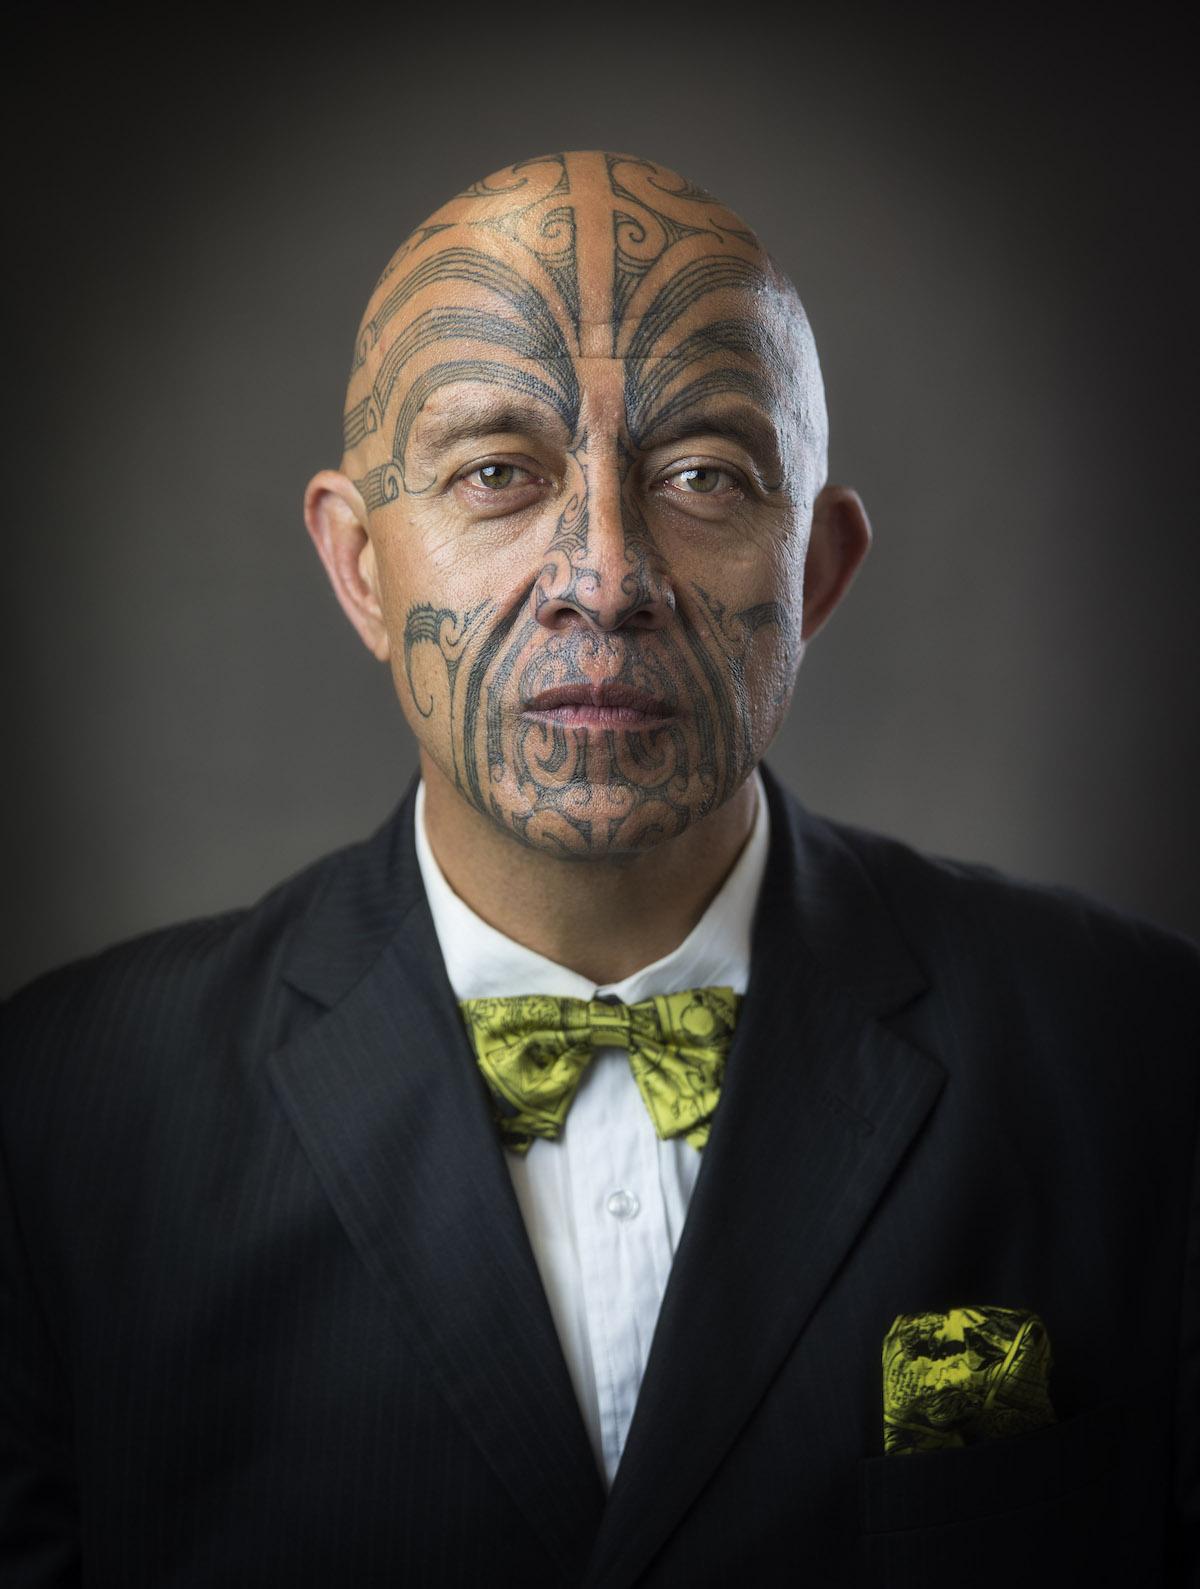 Maori Facial Tattoo: Artist Explores The Near Extinction Of Māori Face And Body